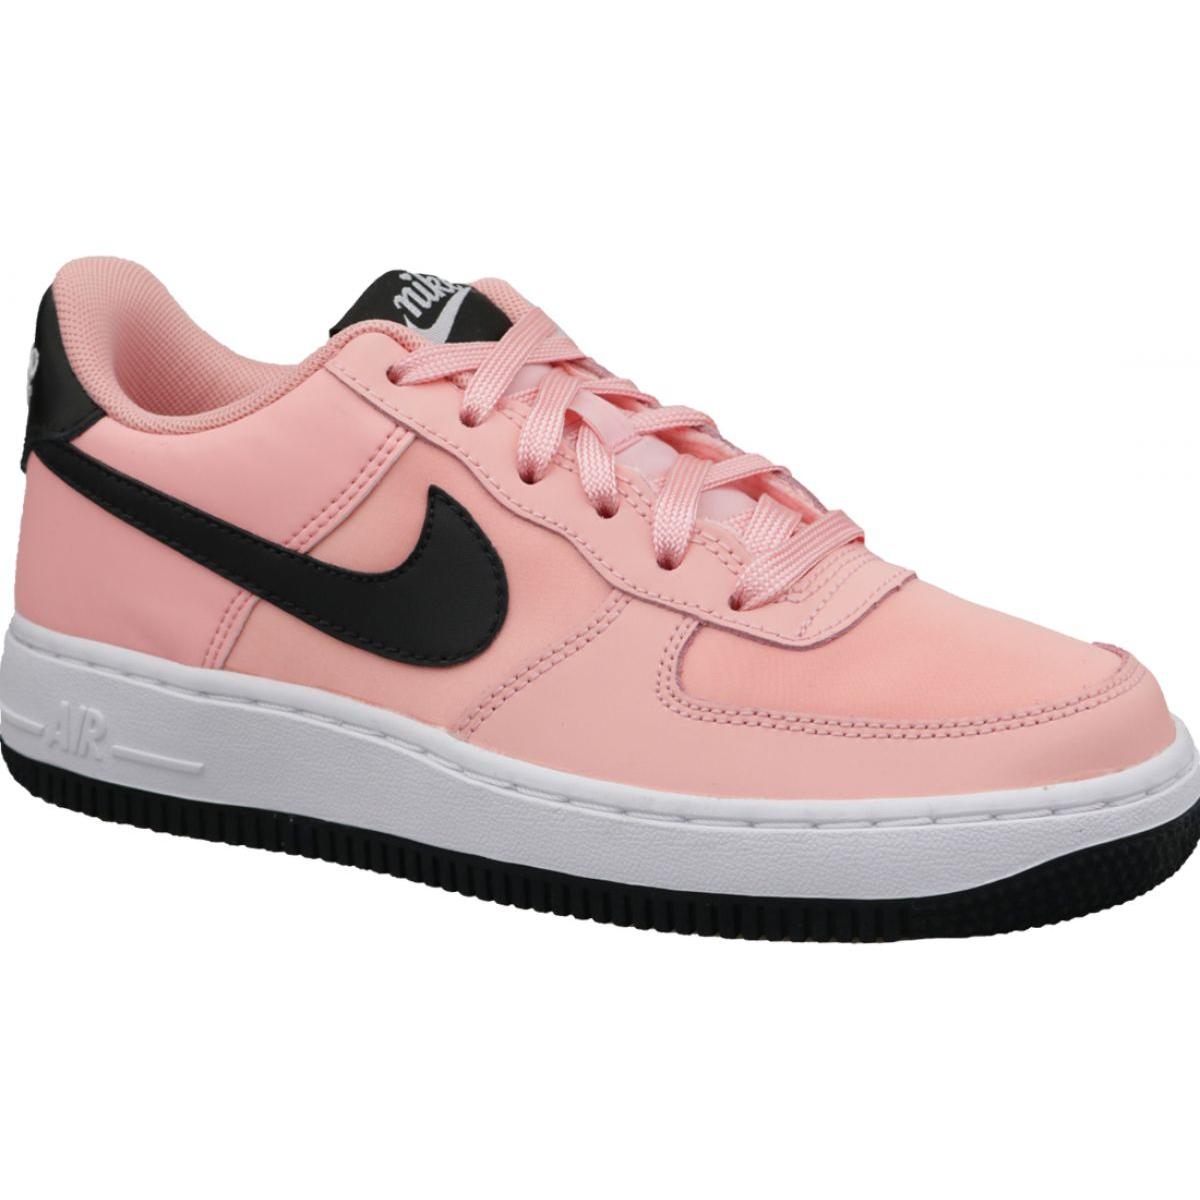 Rosa Nike Air Force 1 VDay Gs Zapatos W BQ6980 600